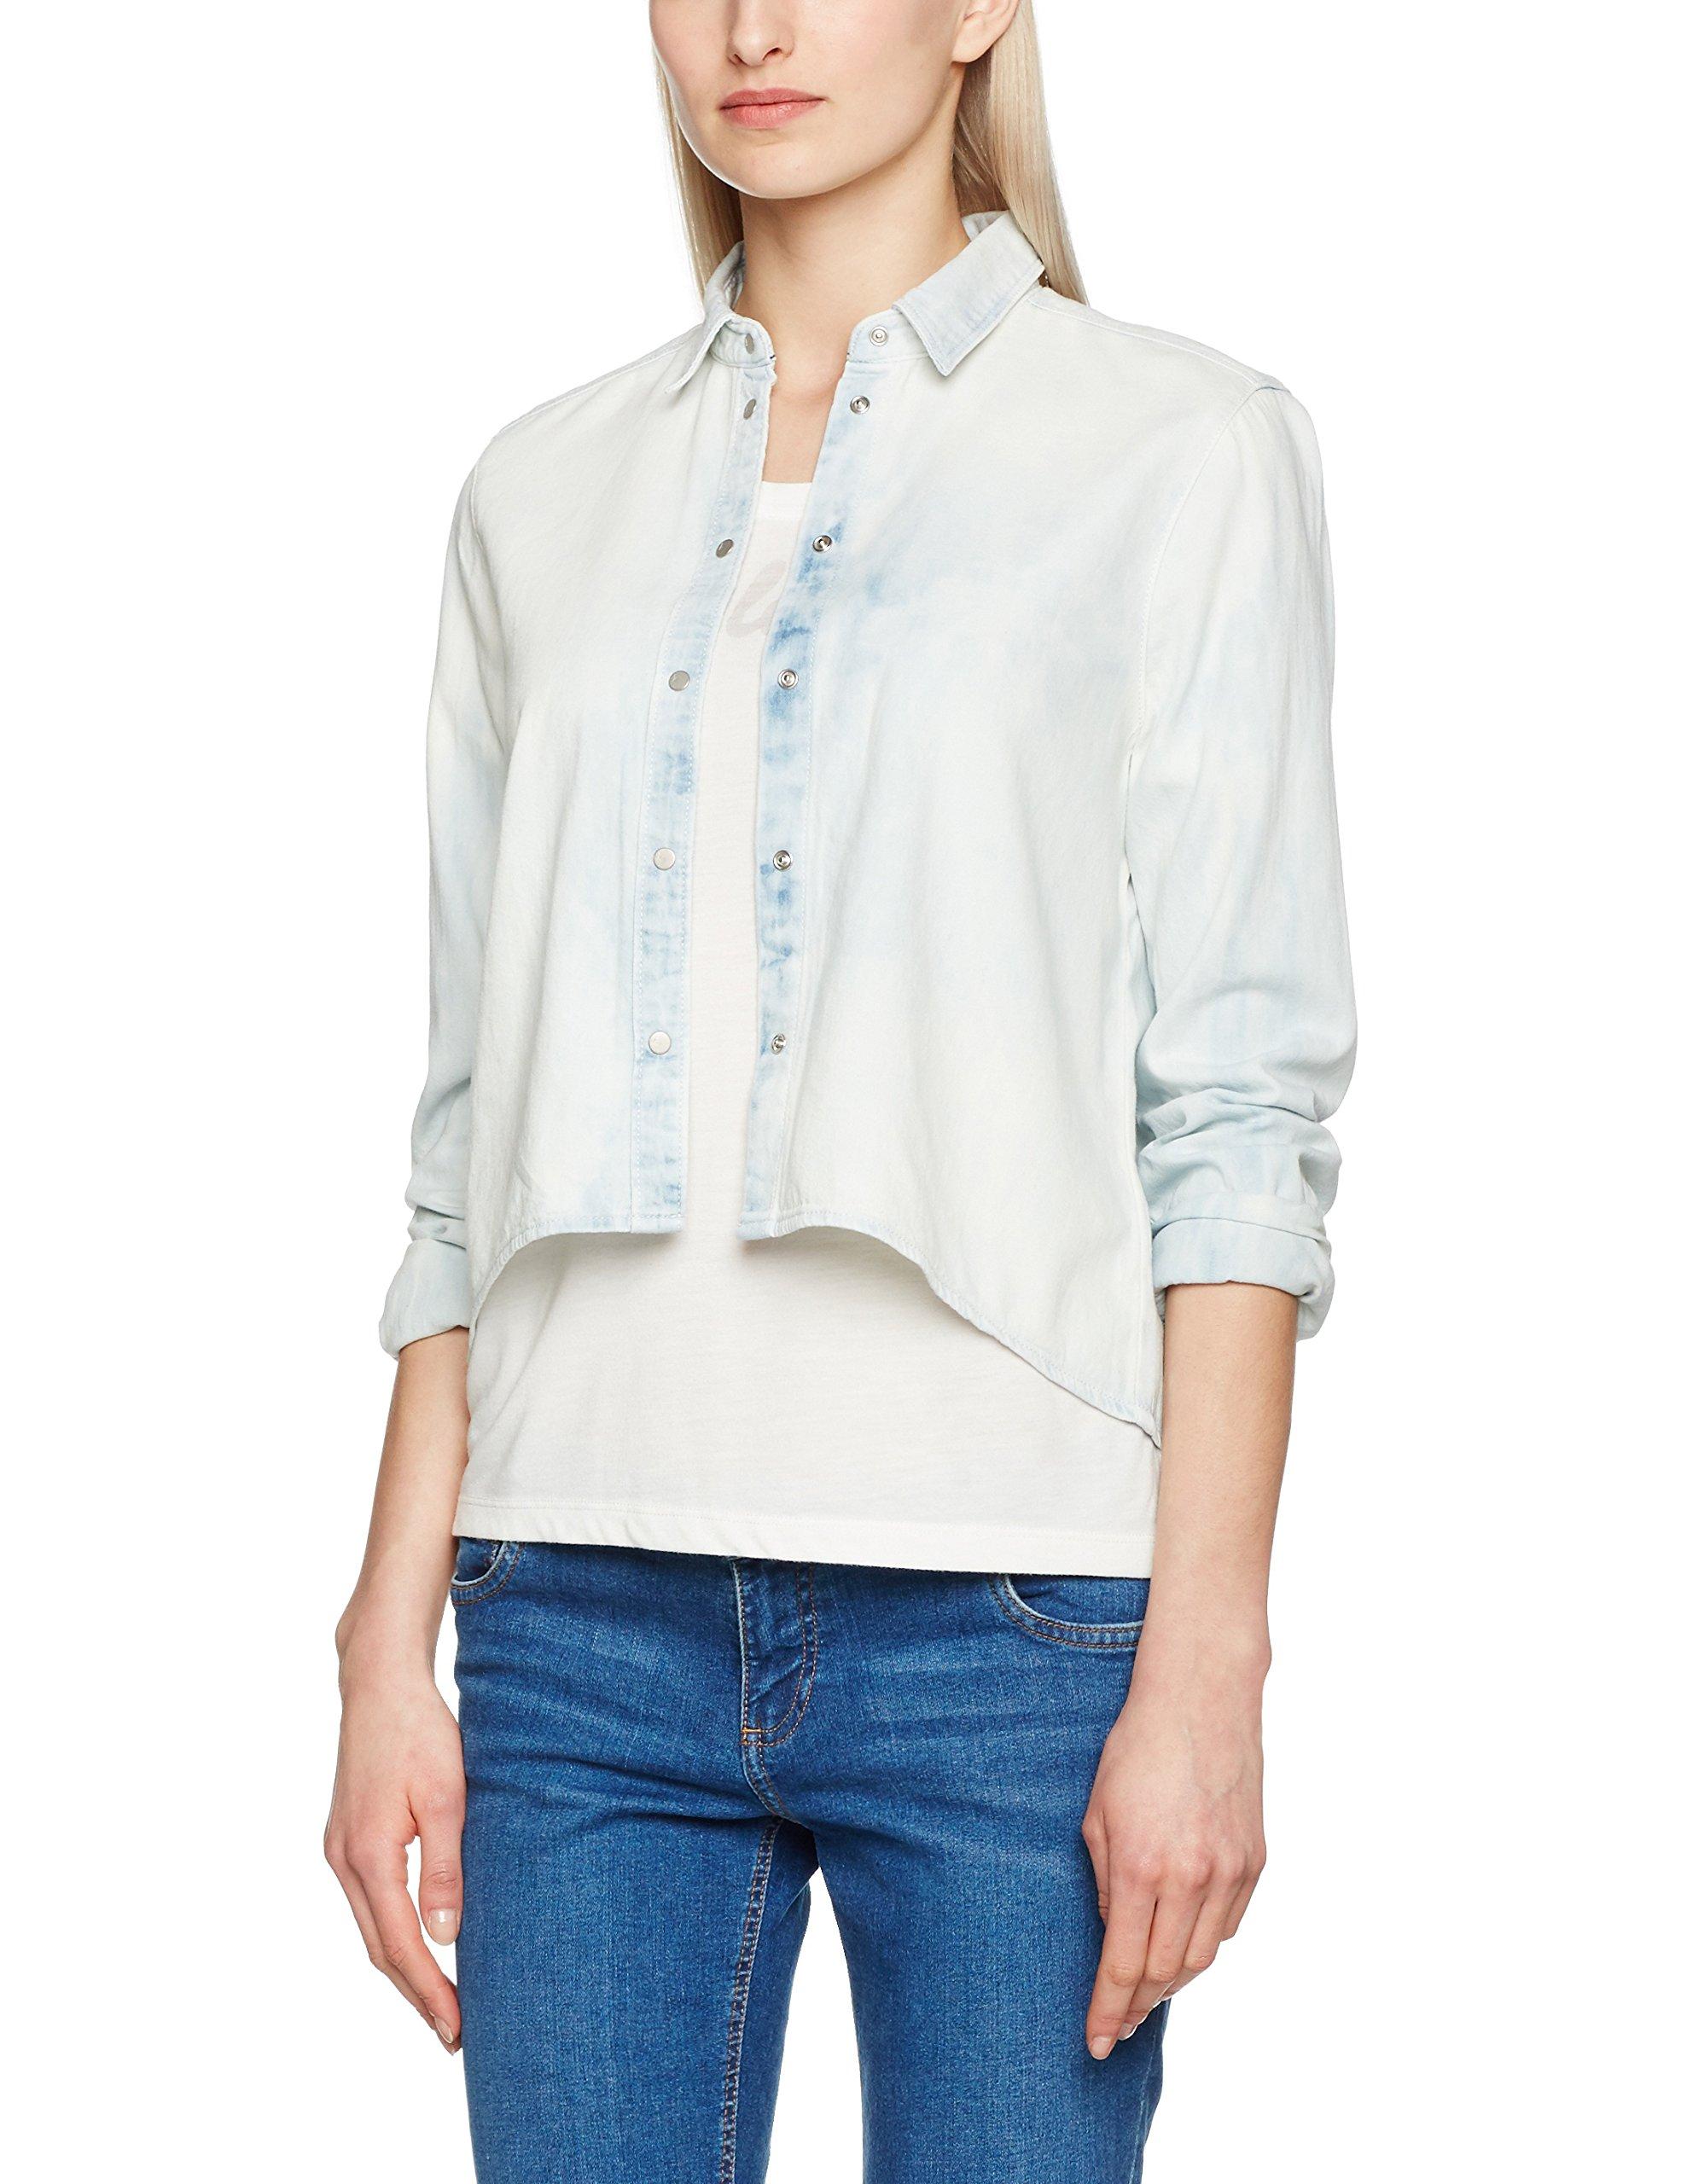 Jeans High Klein blue FabricantSmallFemme Calvin 913taille Shirt Low TornadoBleu lFK3uJ1Tc